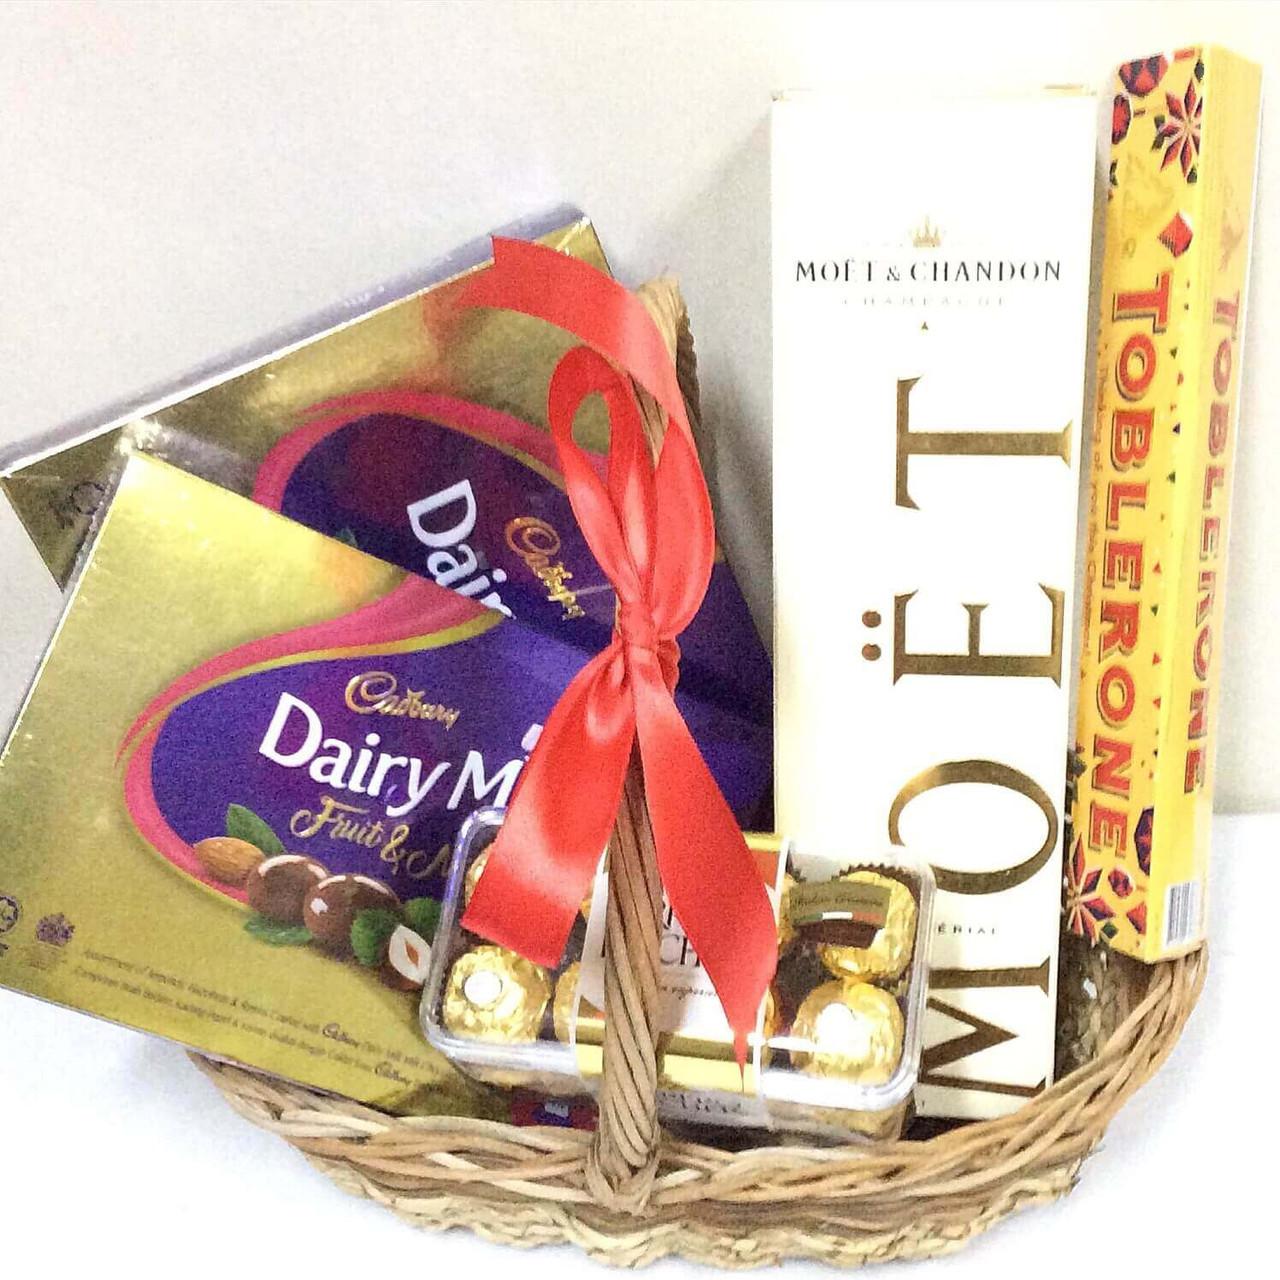 Moet & Chocolates Gift Basket